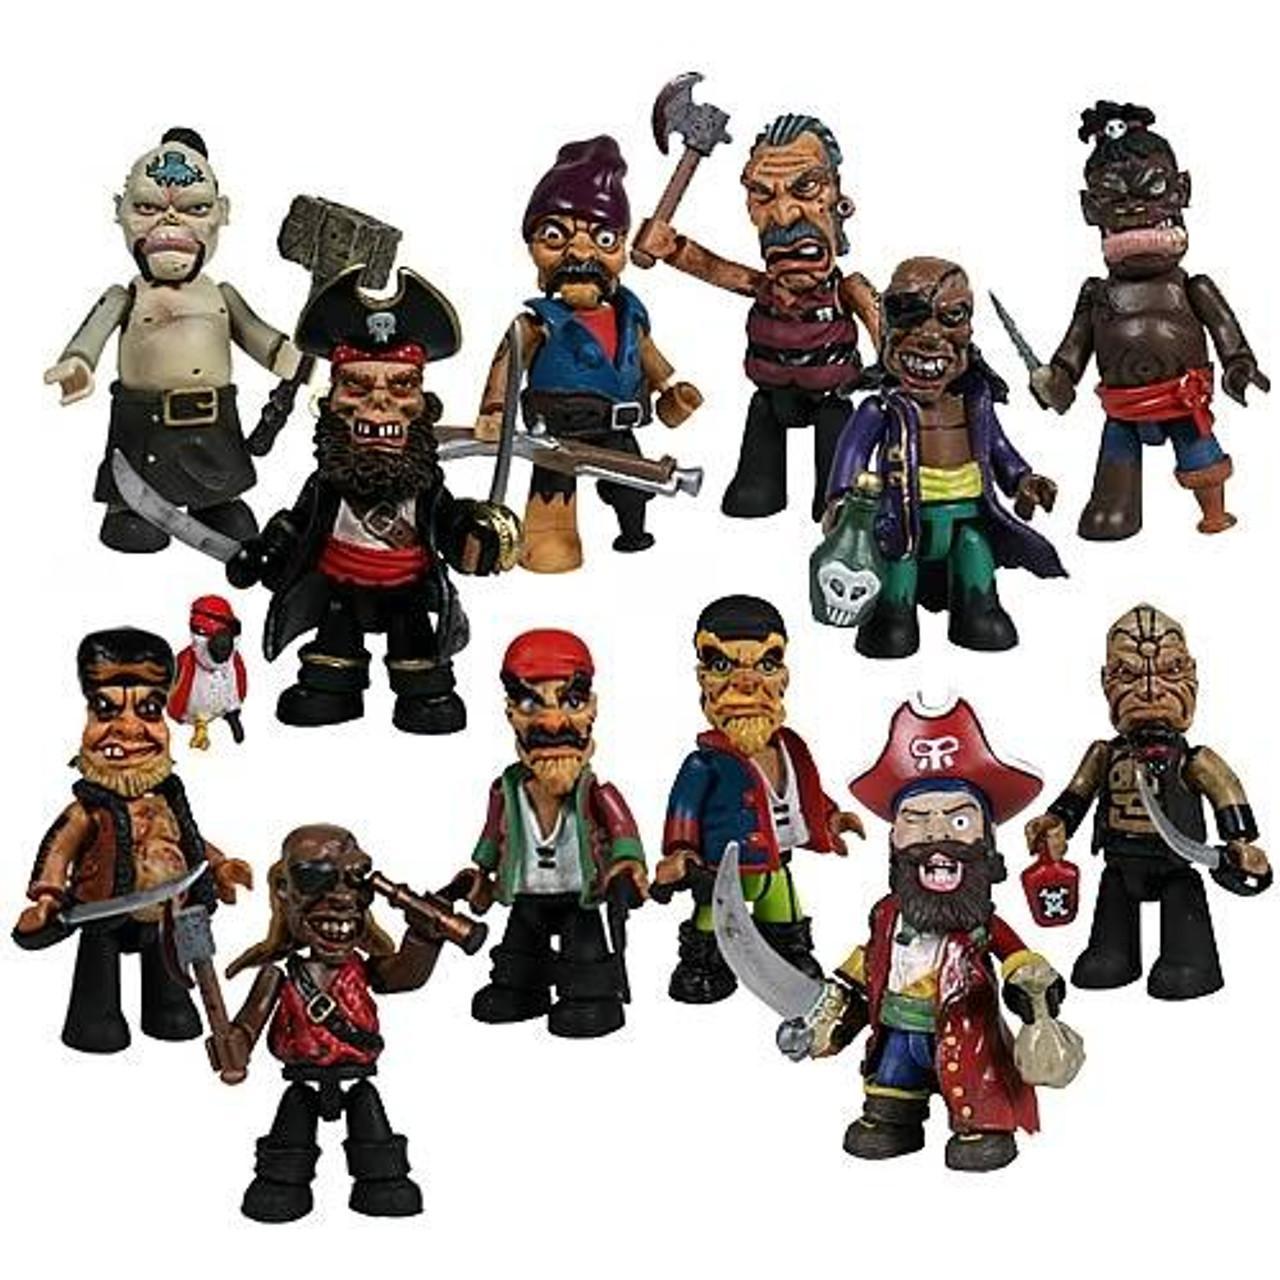 Mez-Itz Pirates Series 1 Set of 12 Mini Figures